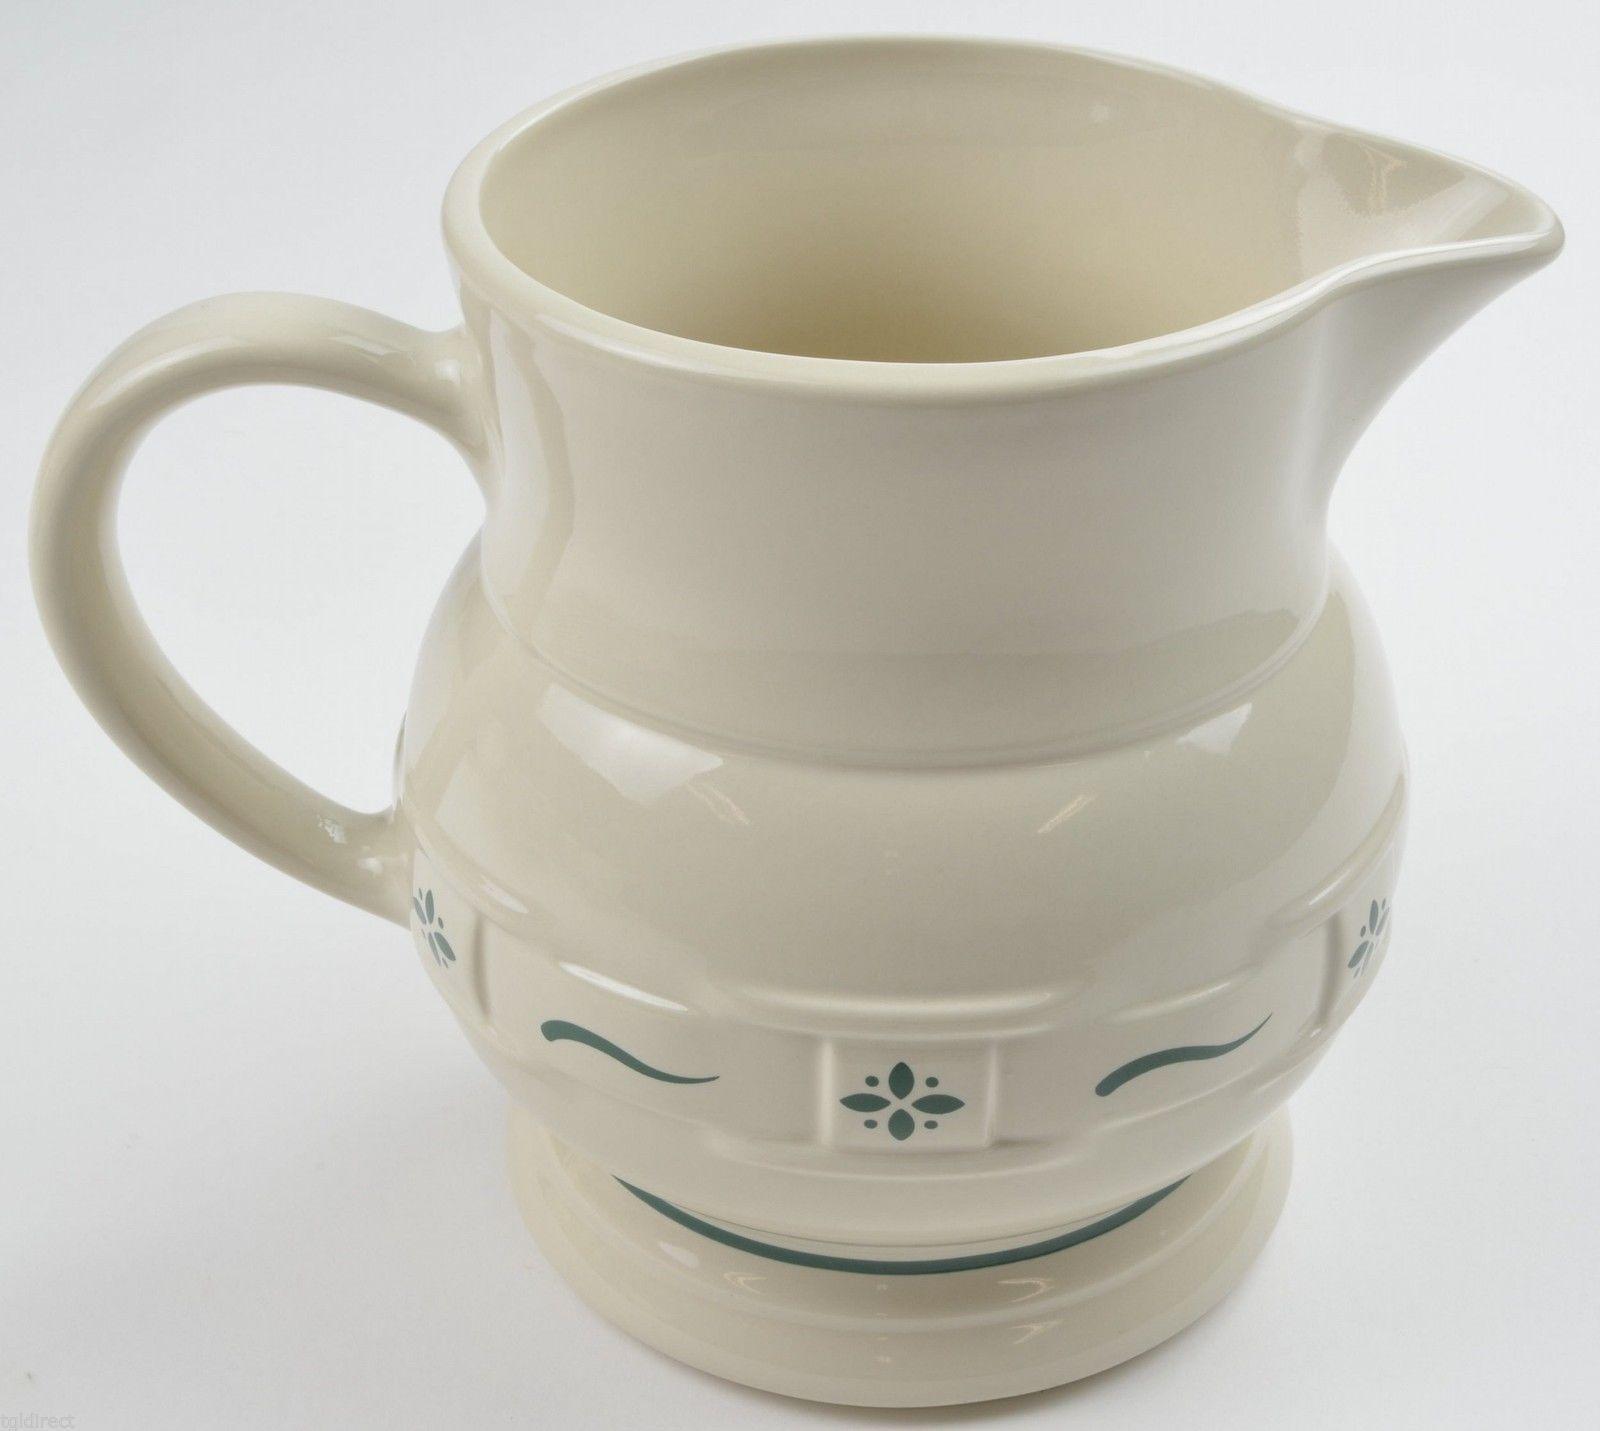 Longaberger Pottery USA Woven Traditions Heritage Green 64 Oz Pitcher China - $42.99